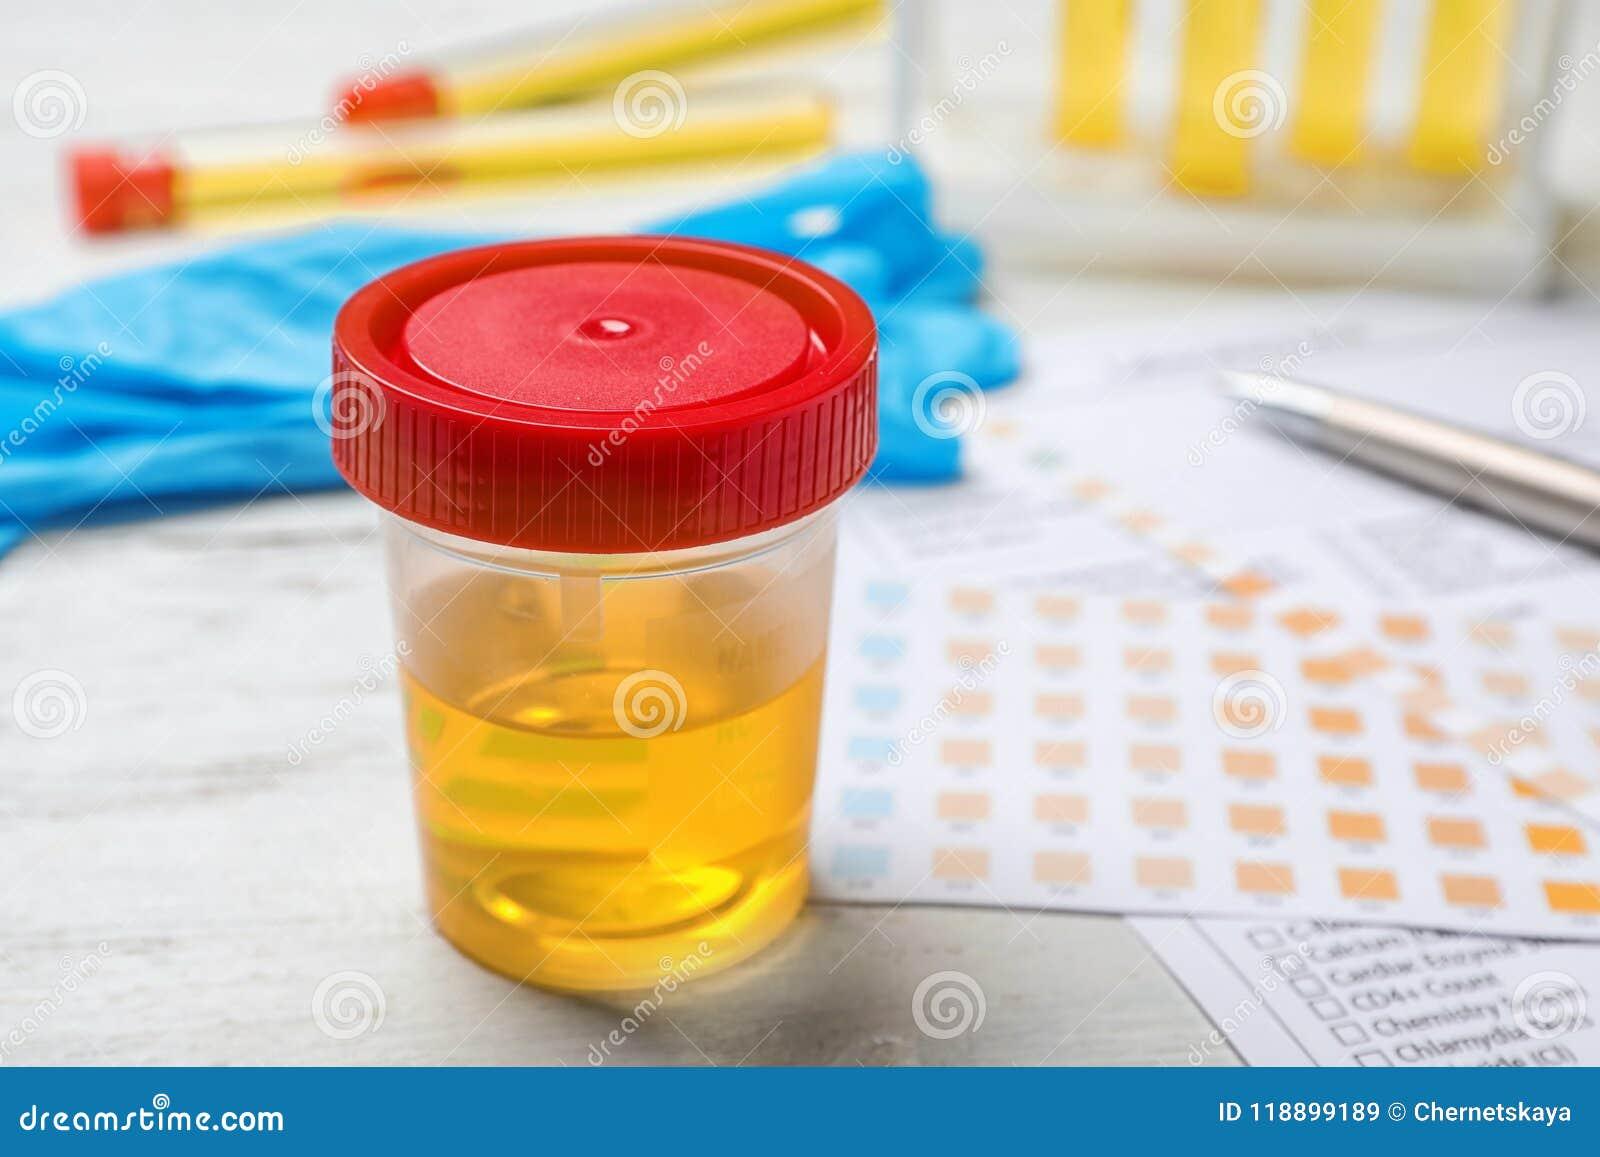 Jar with urine sample on table. Urology concept